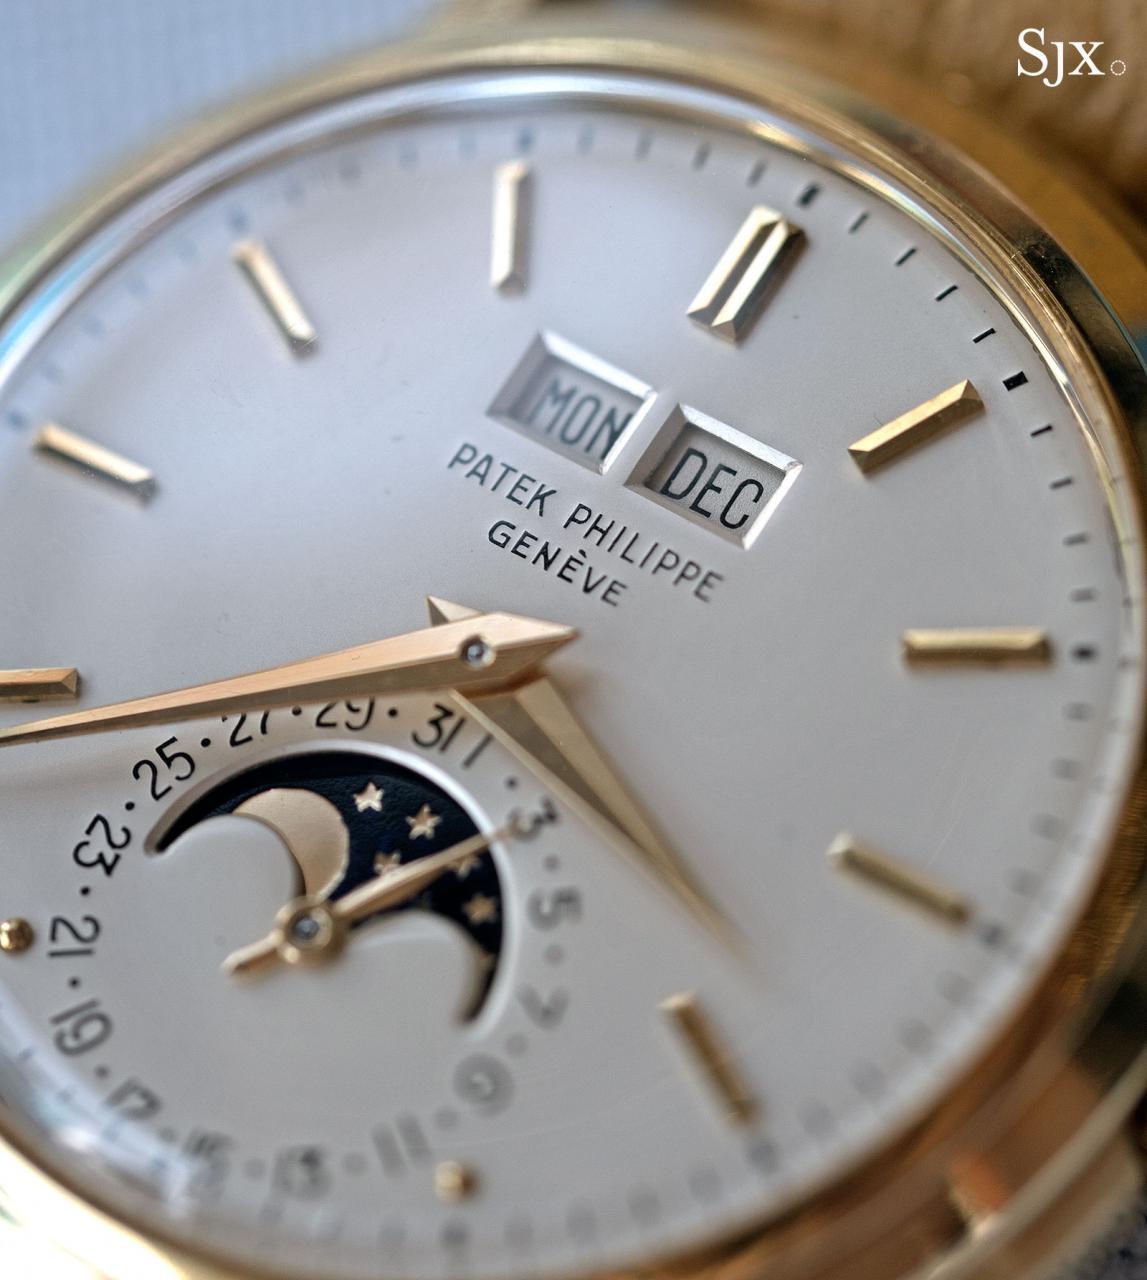 Patek Philippe 3449 perpetual calendar 8